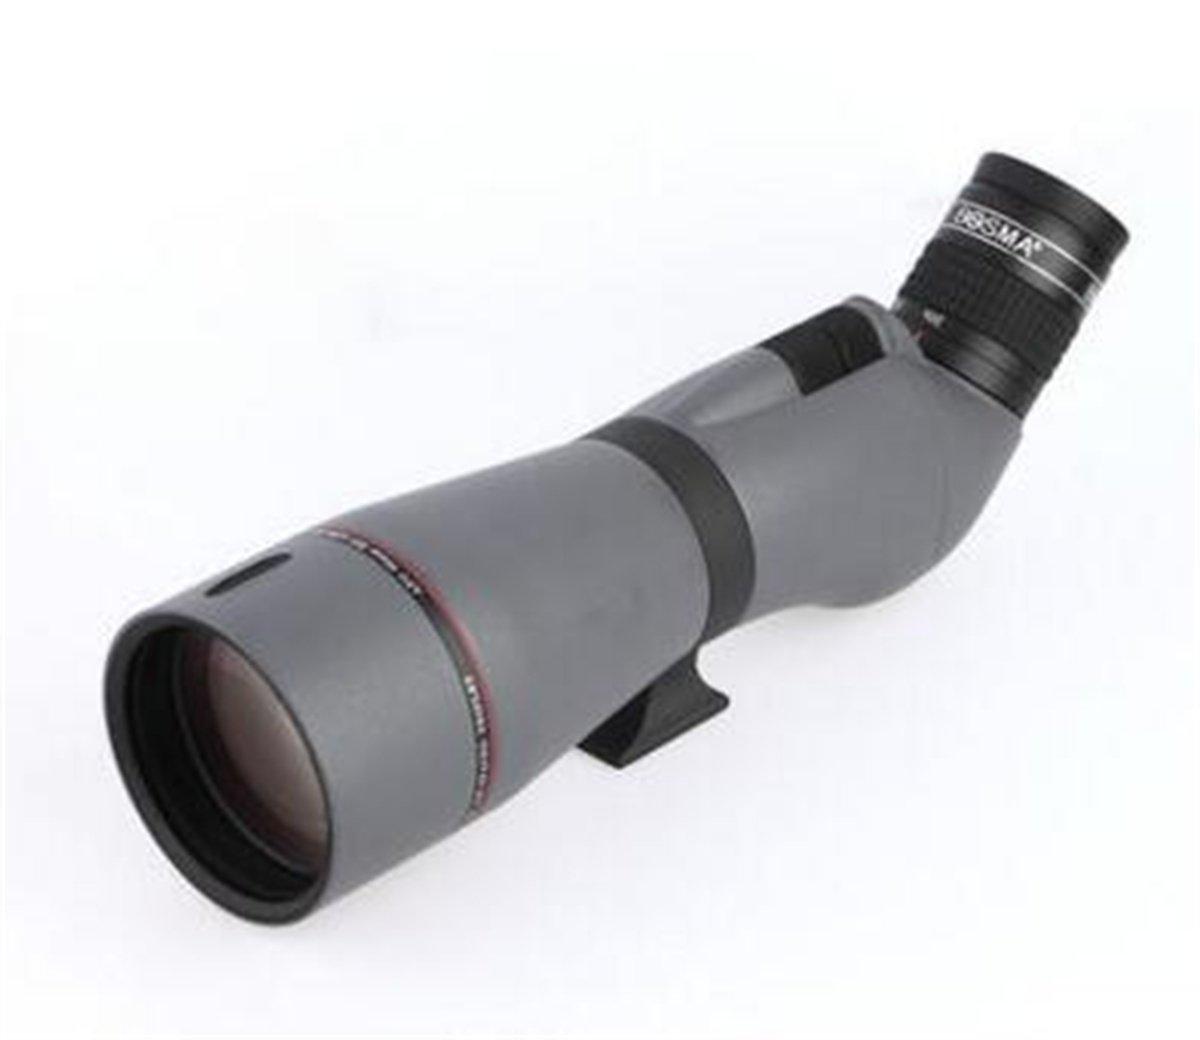 Bosma telescope 20-60x86ED swan ED86 spotting scopes spotting monocular high power zoom lens Top spotting scope Binoculars